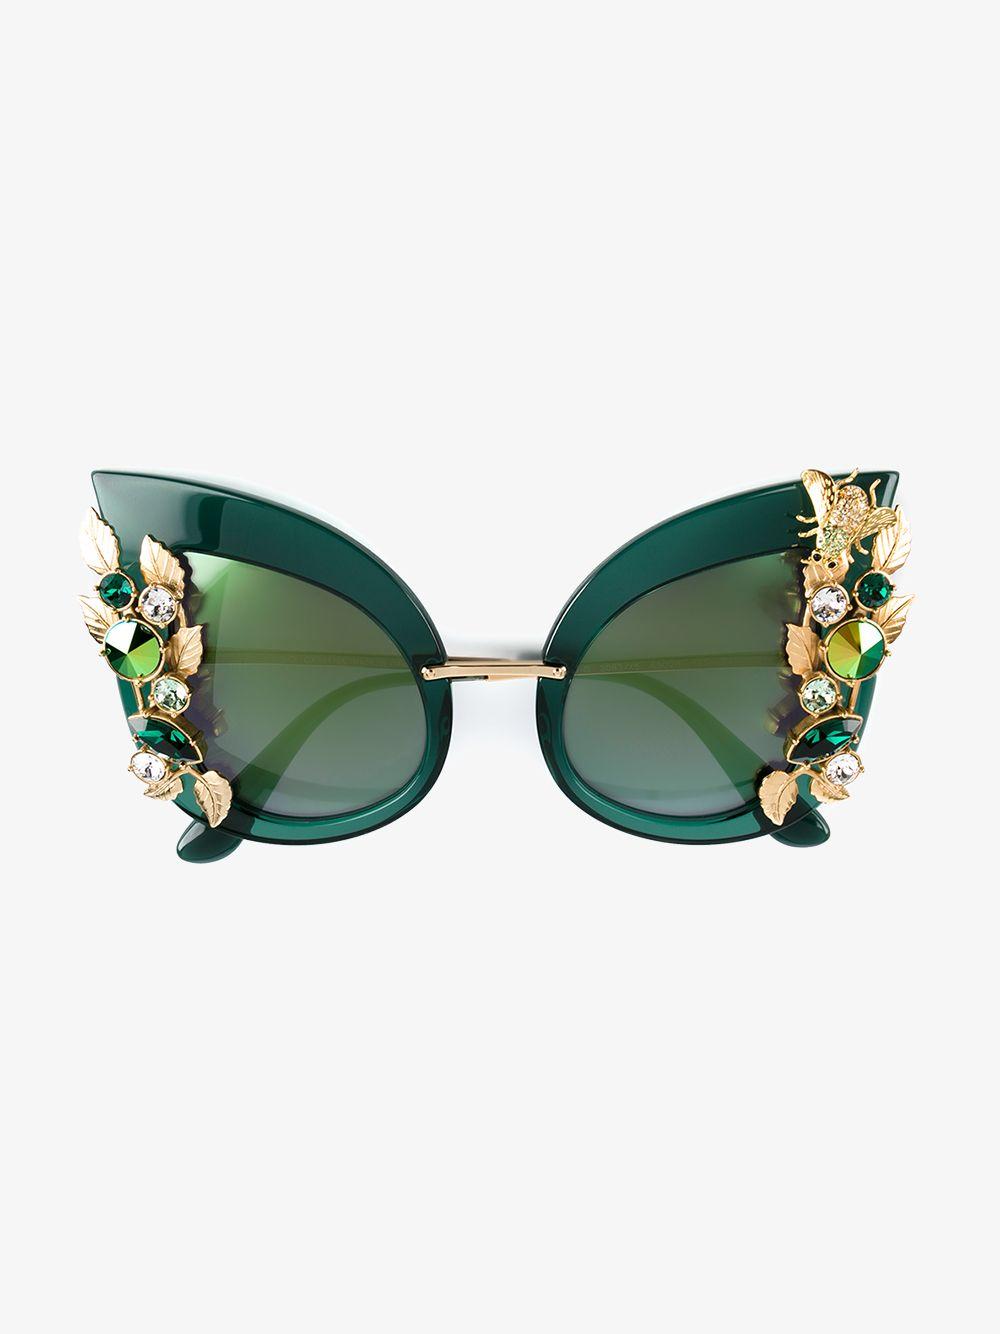 3780363bf5c Dolce   Gabbana crystal embellished sunglasses